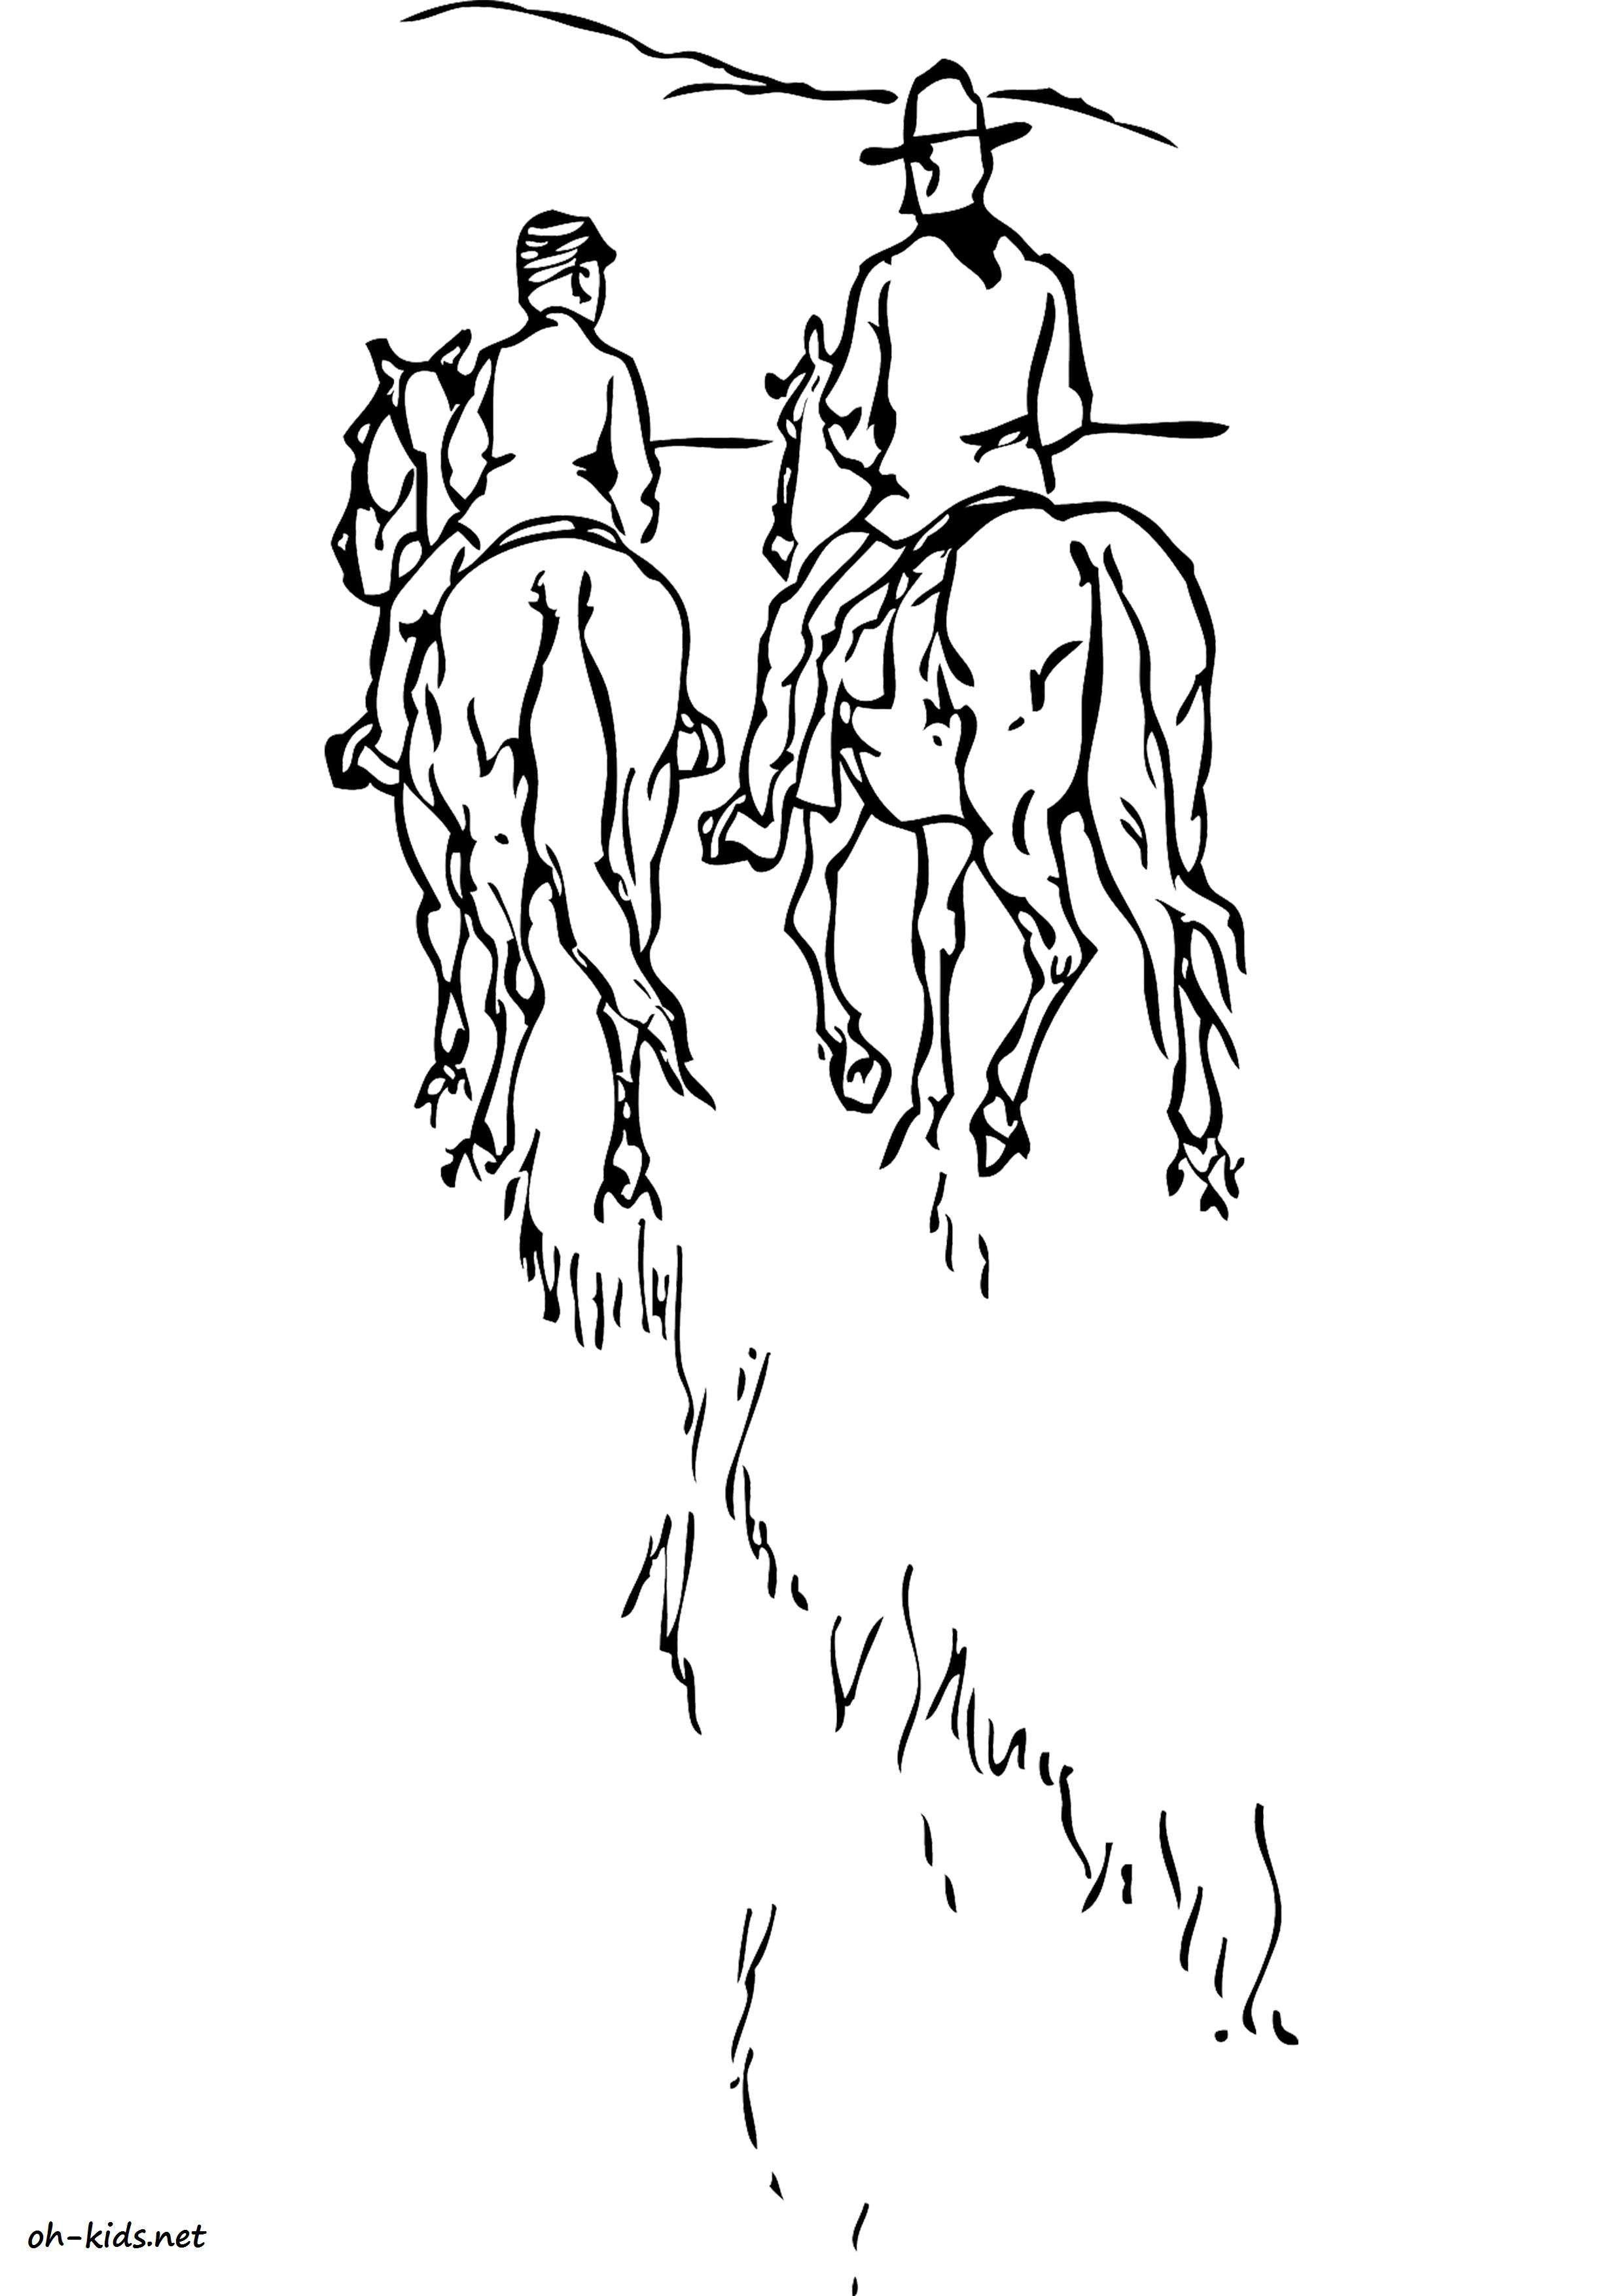 Dessin 1372 coloriage quitation imprimer oh - Coloriage equitation ...